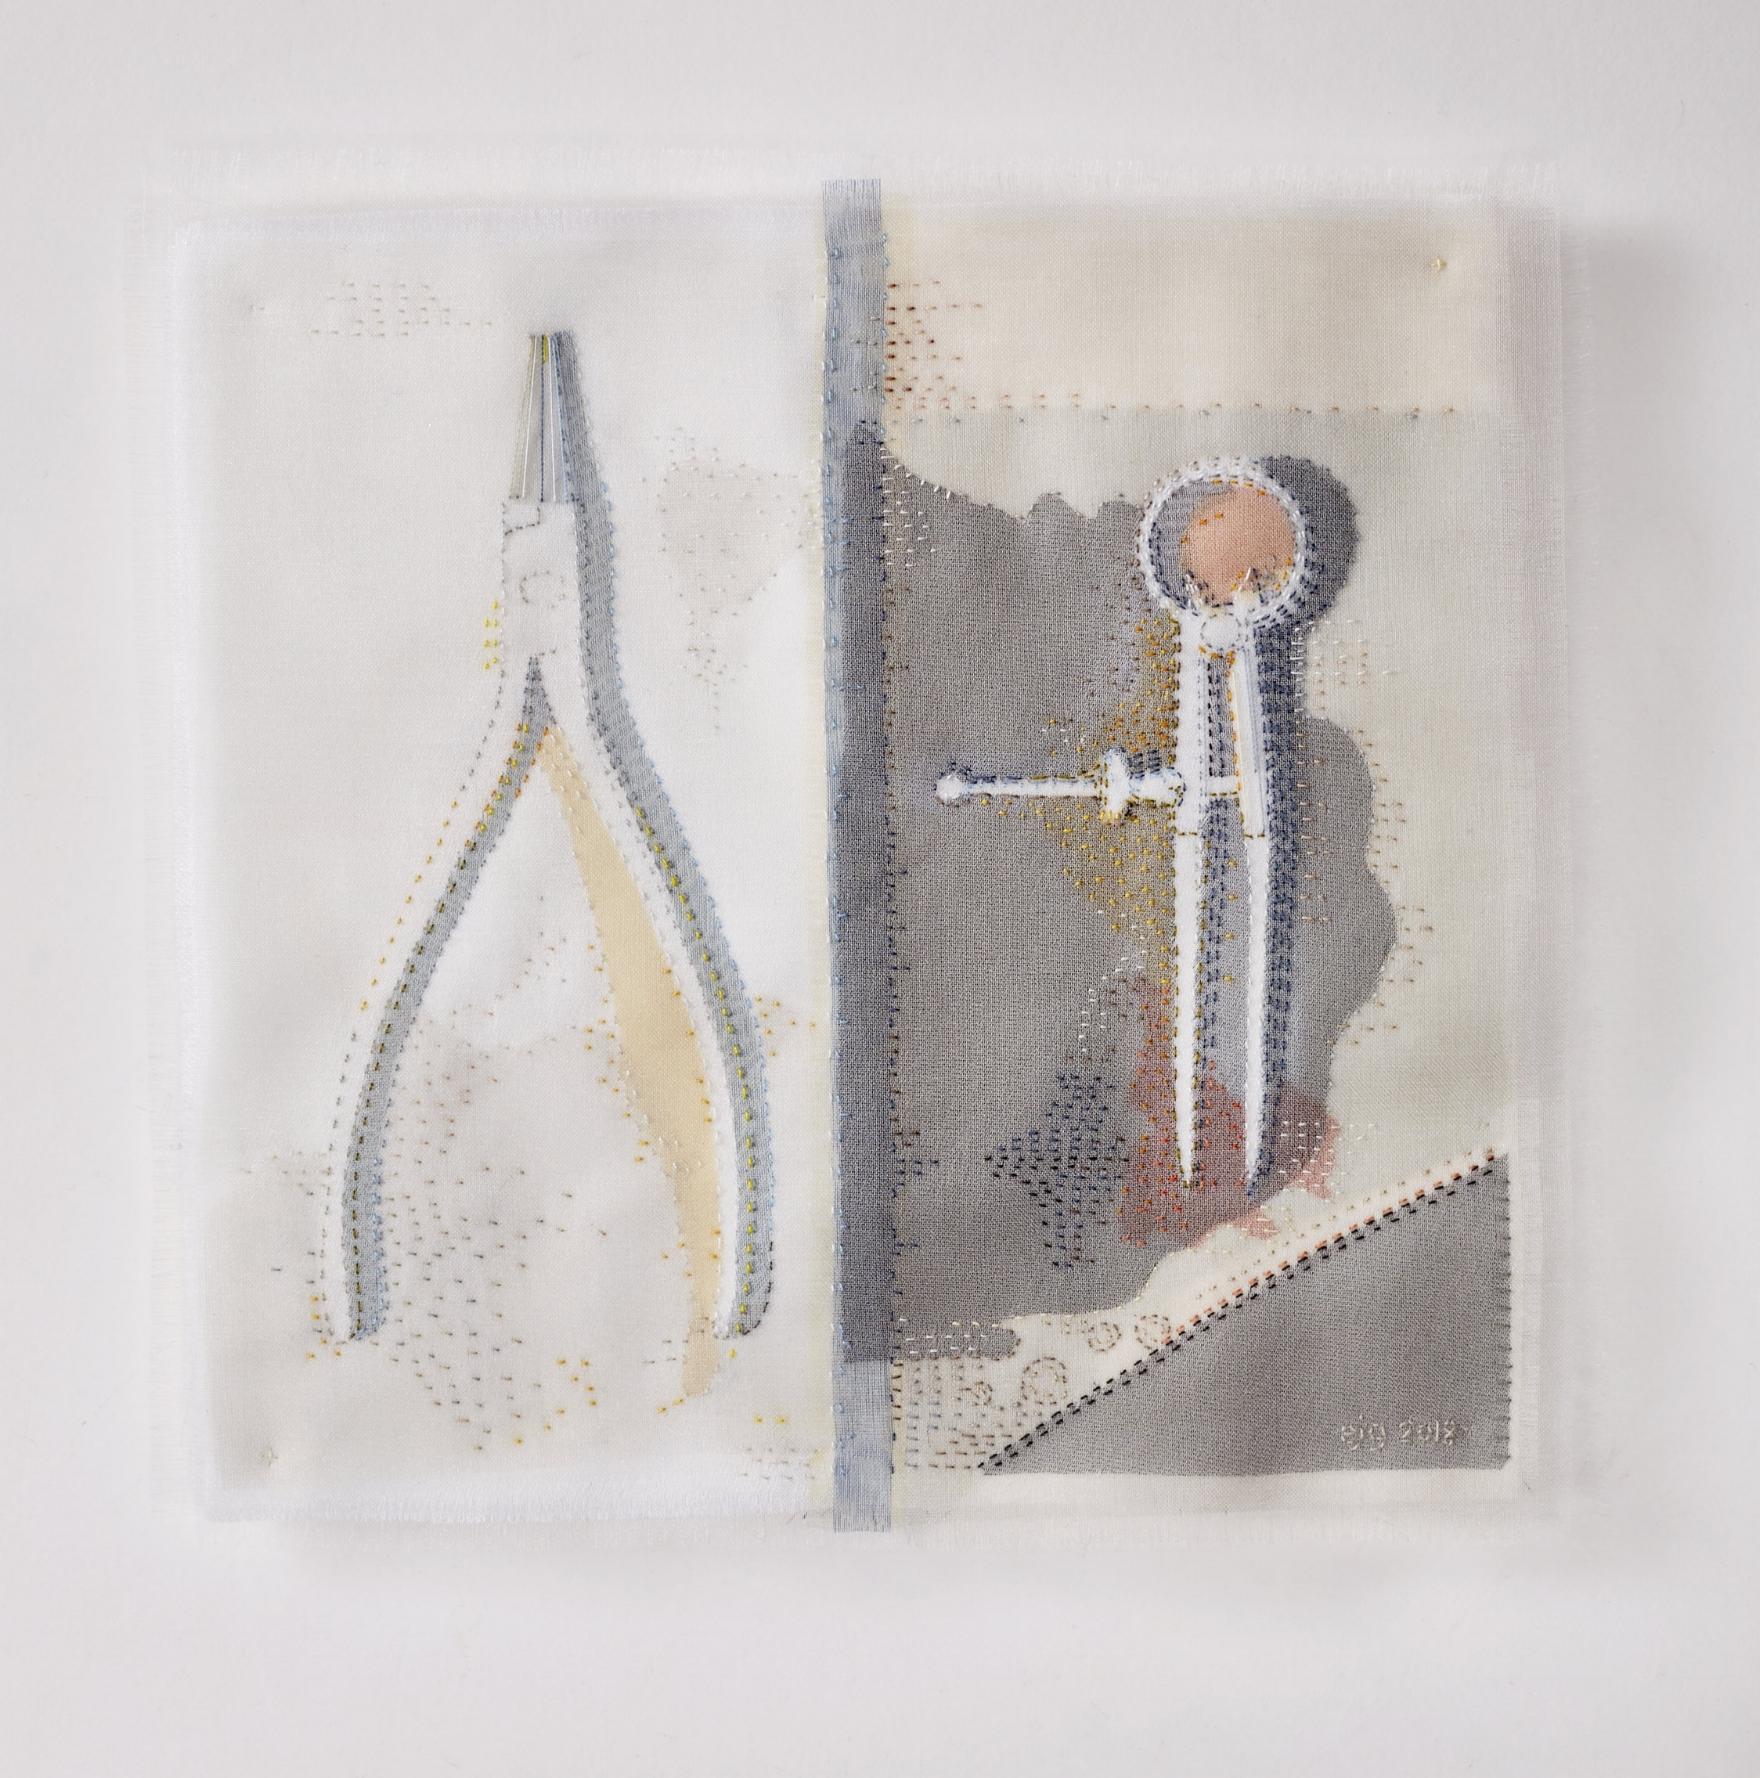 Portrait of a Jeweller 2018, 18cm x 18cm, hand stitched silk organza appliqué on linen SOLD